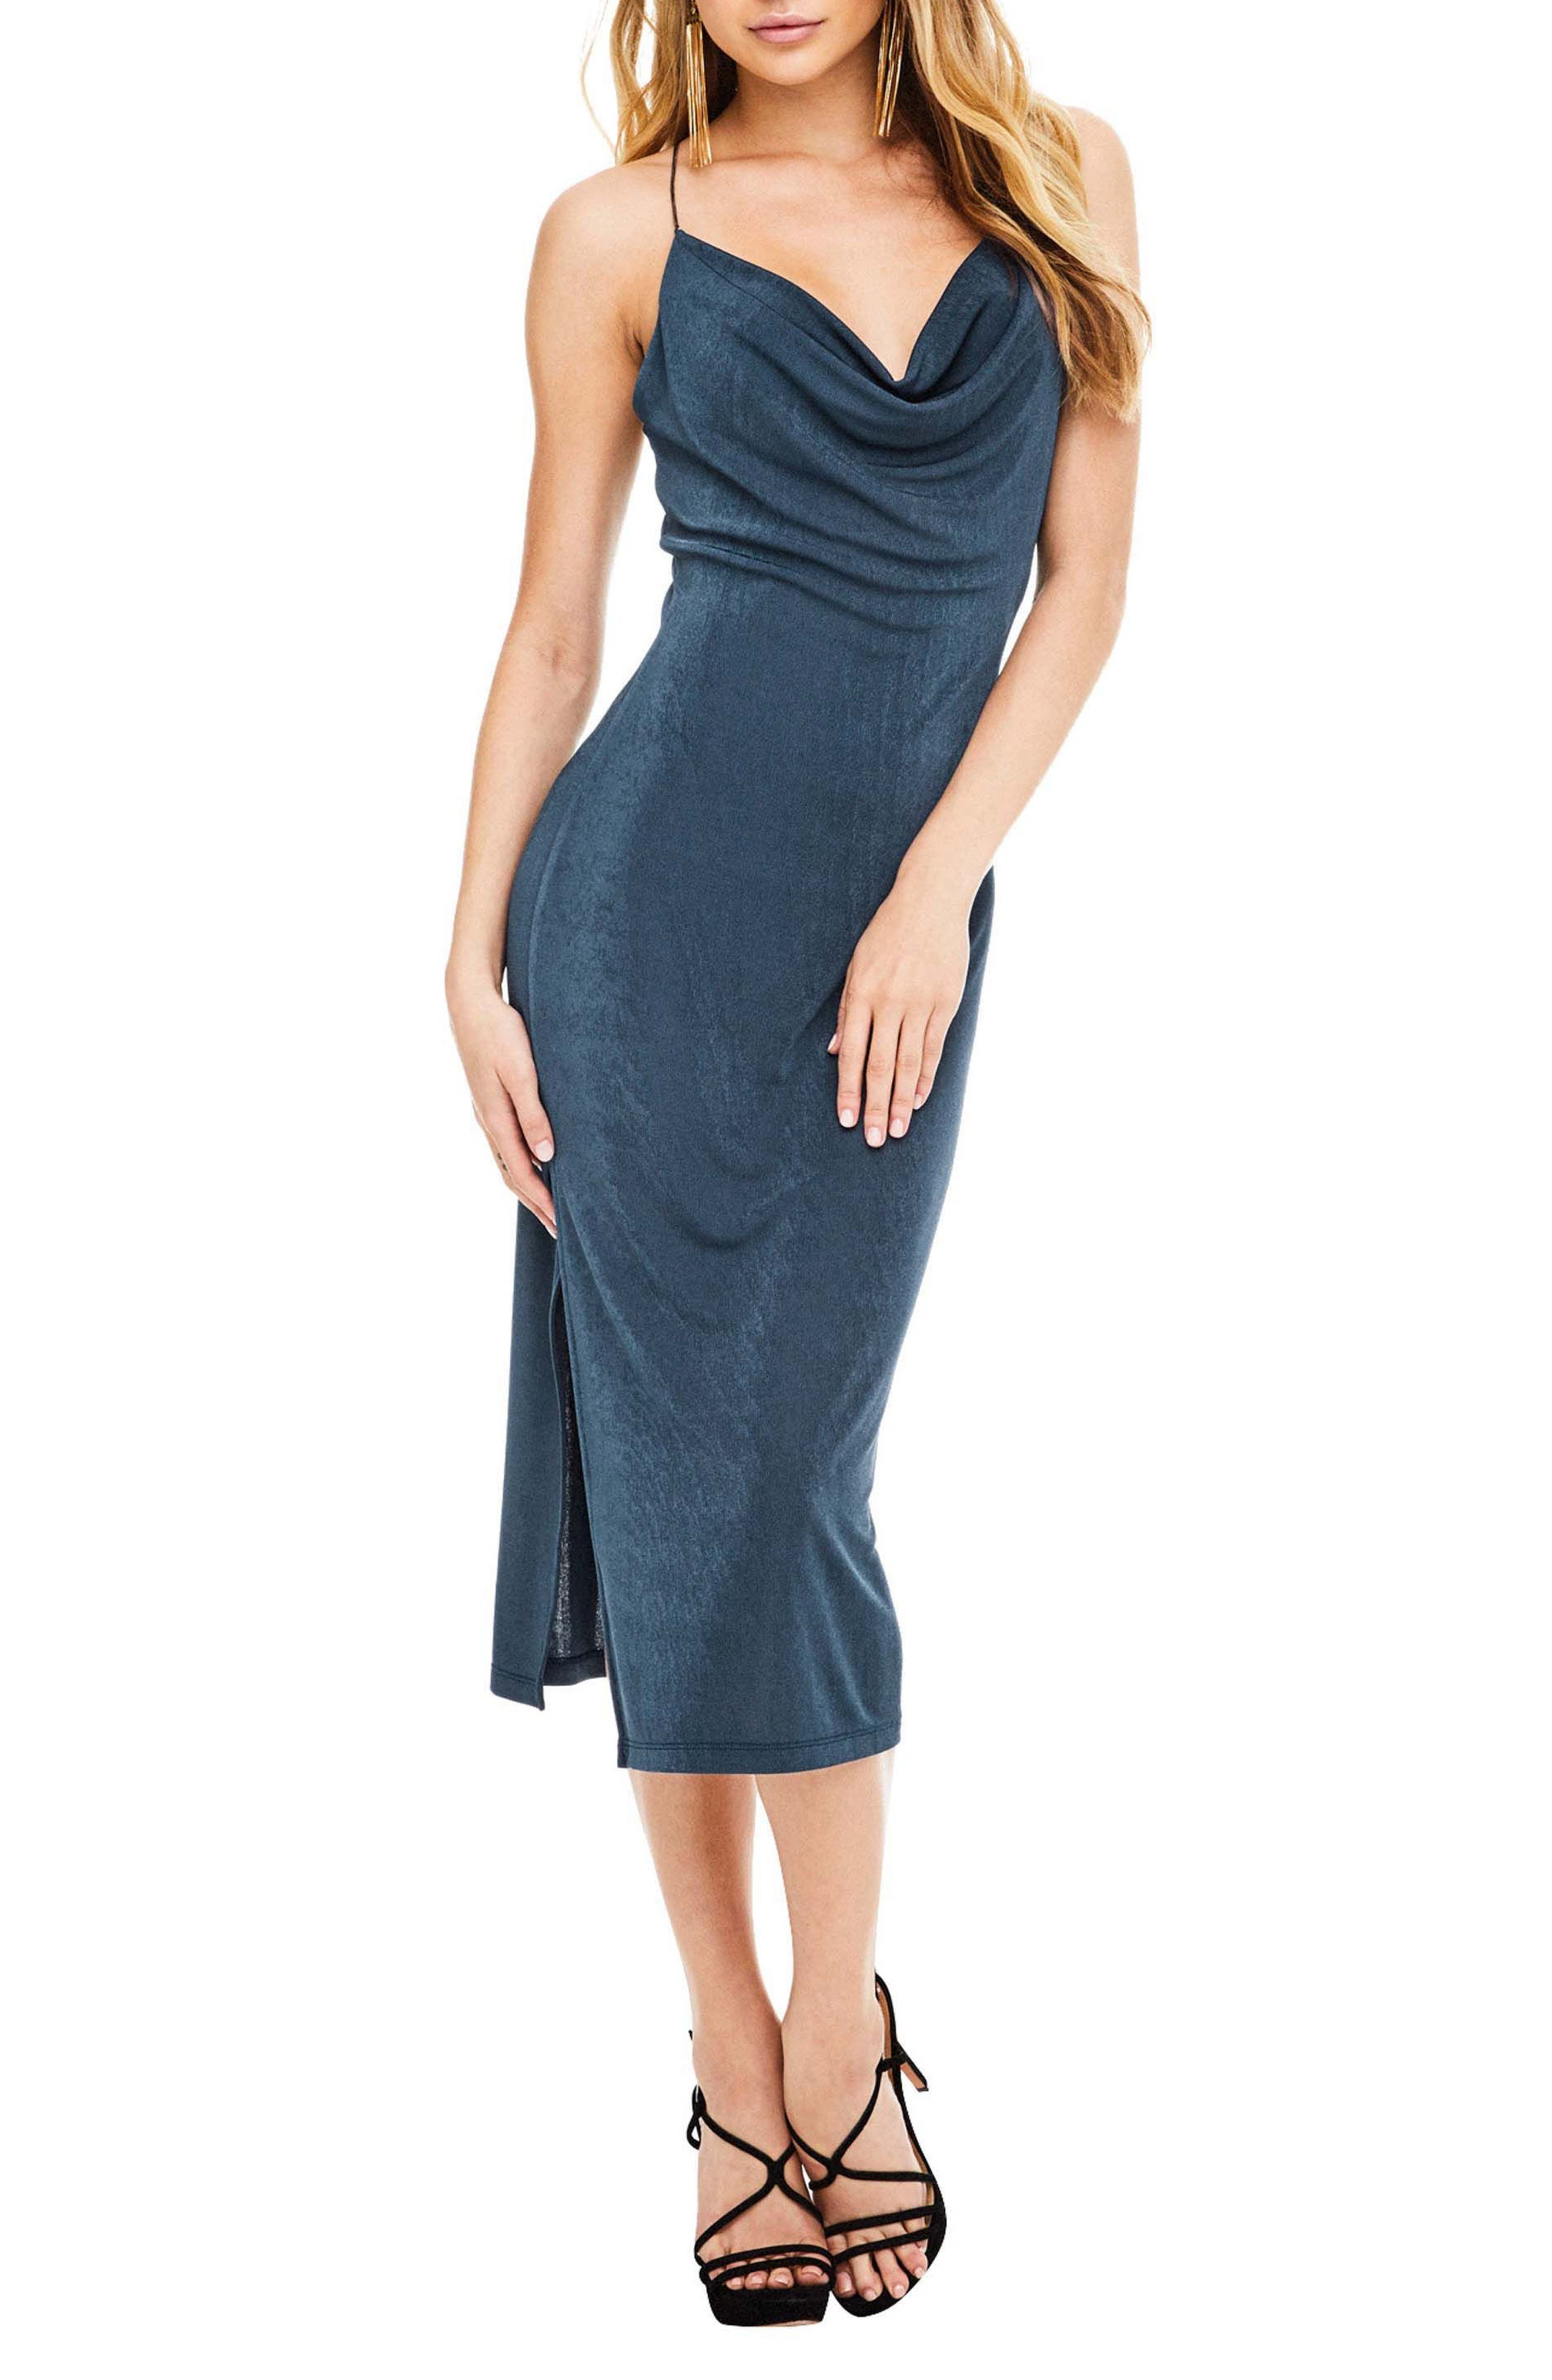 Alternate Image 1 Selected - ASTR the Label Ivana Midi Dress